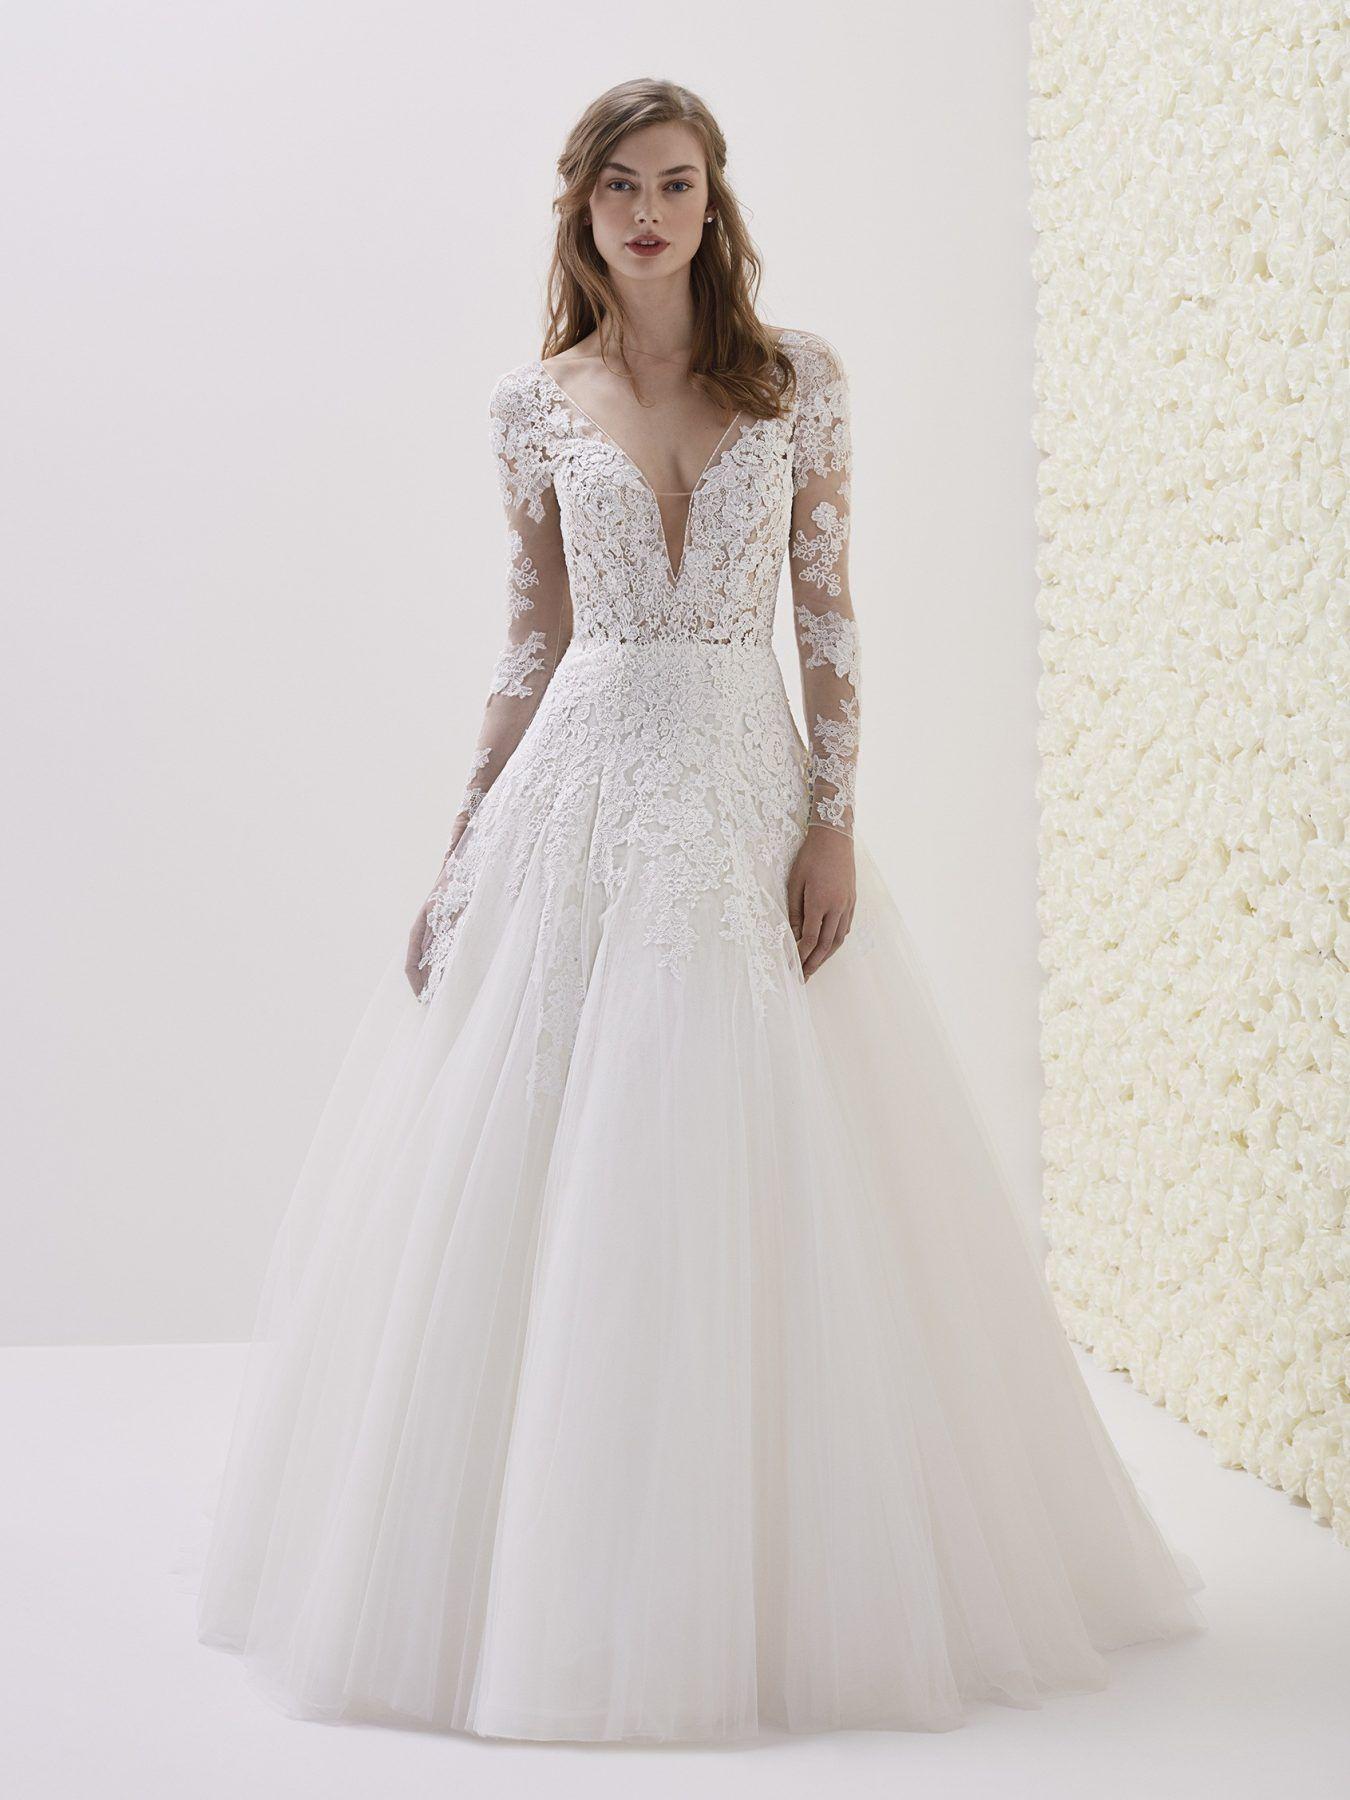 Deep V Neck Long Sleeve Lace A Line Wedding Dress 3 4 And Long